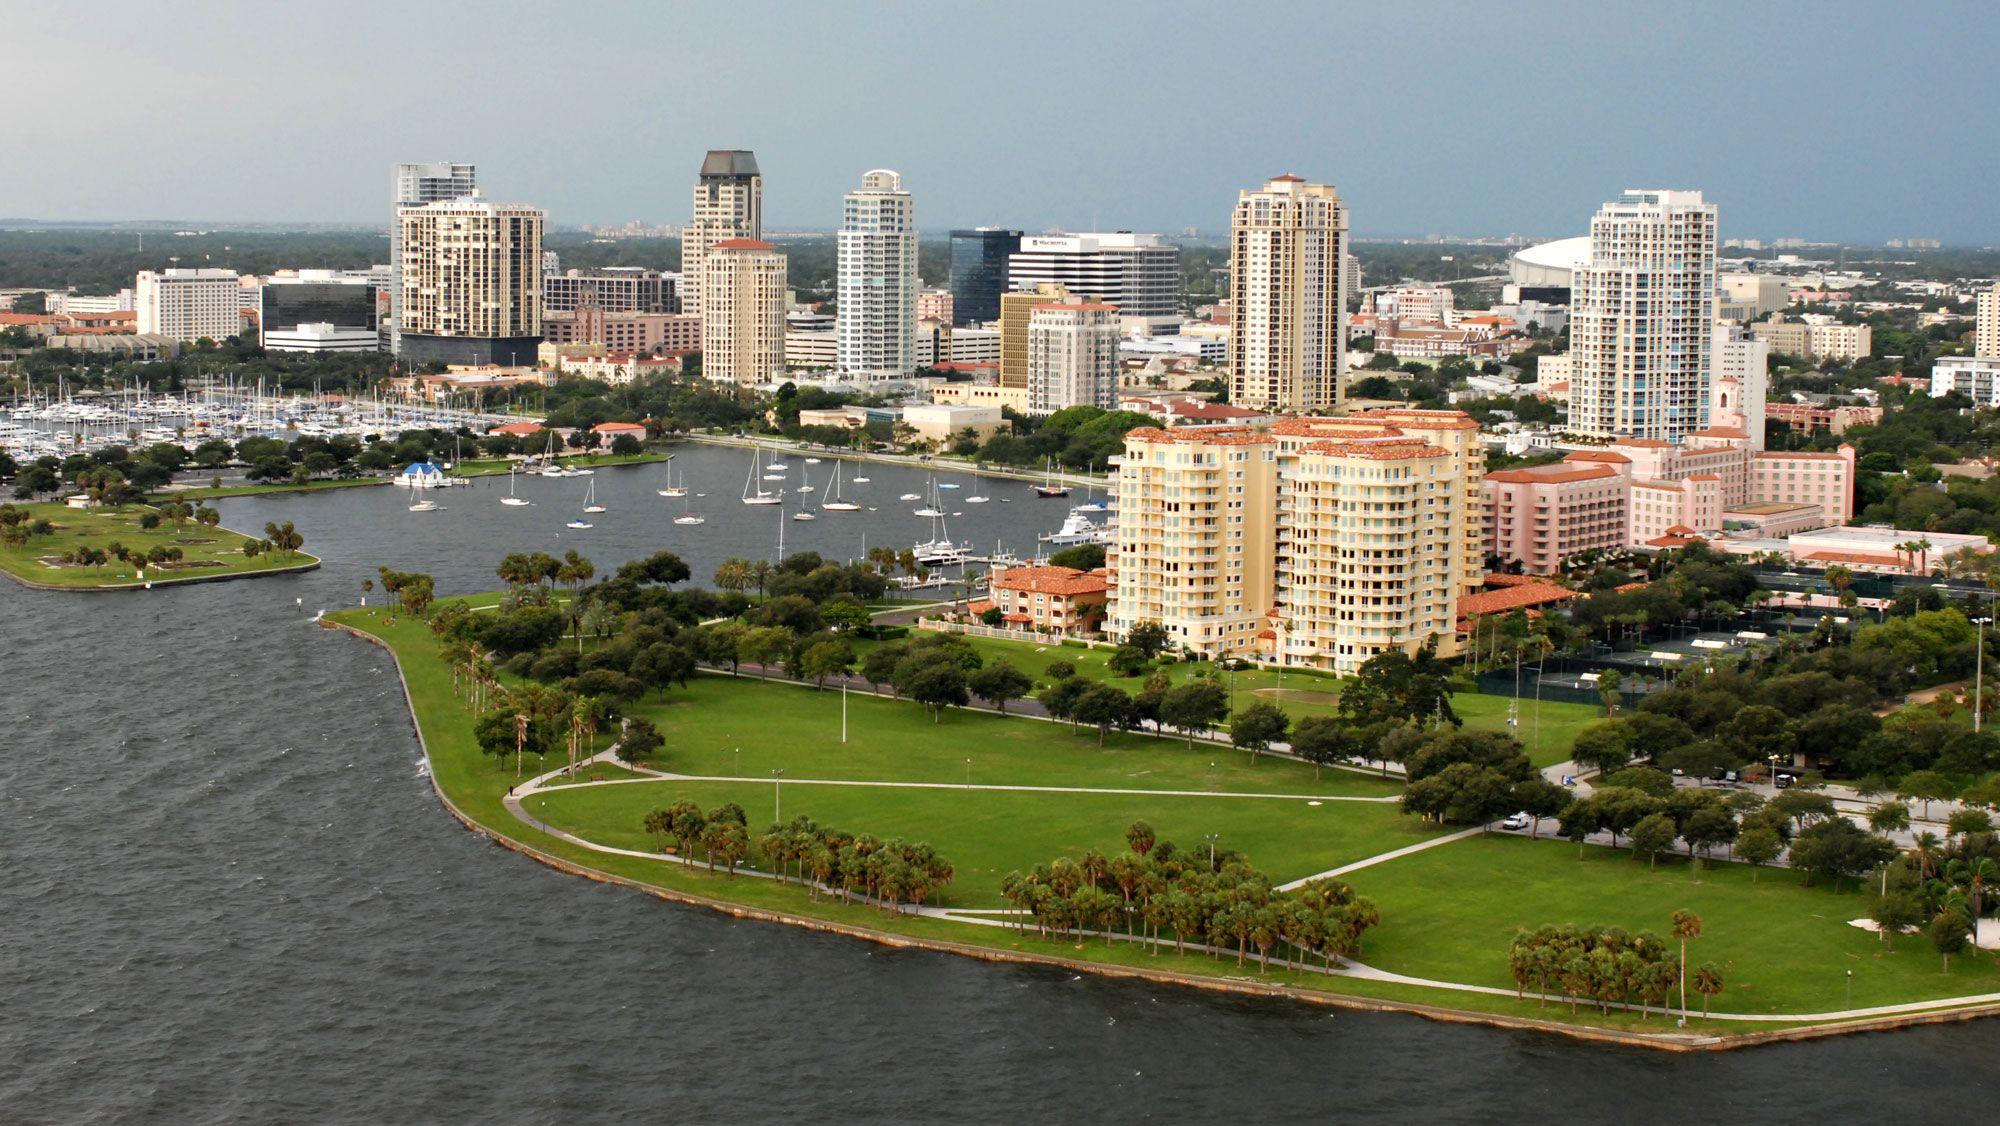 St. Petersburg, Florida Beautiful city St petes beach